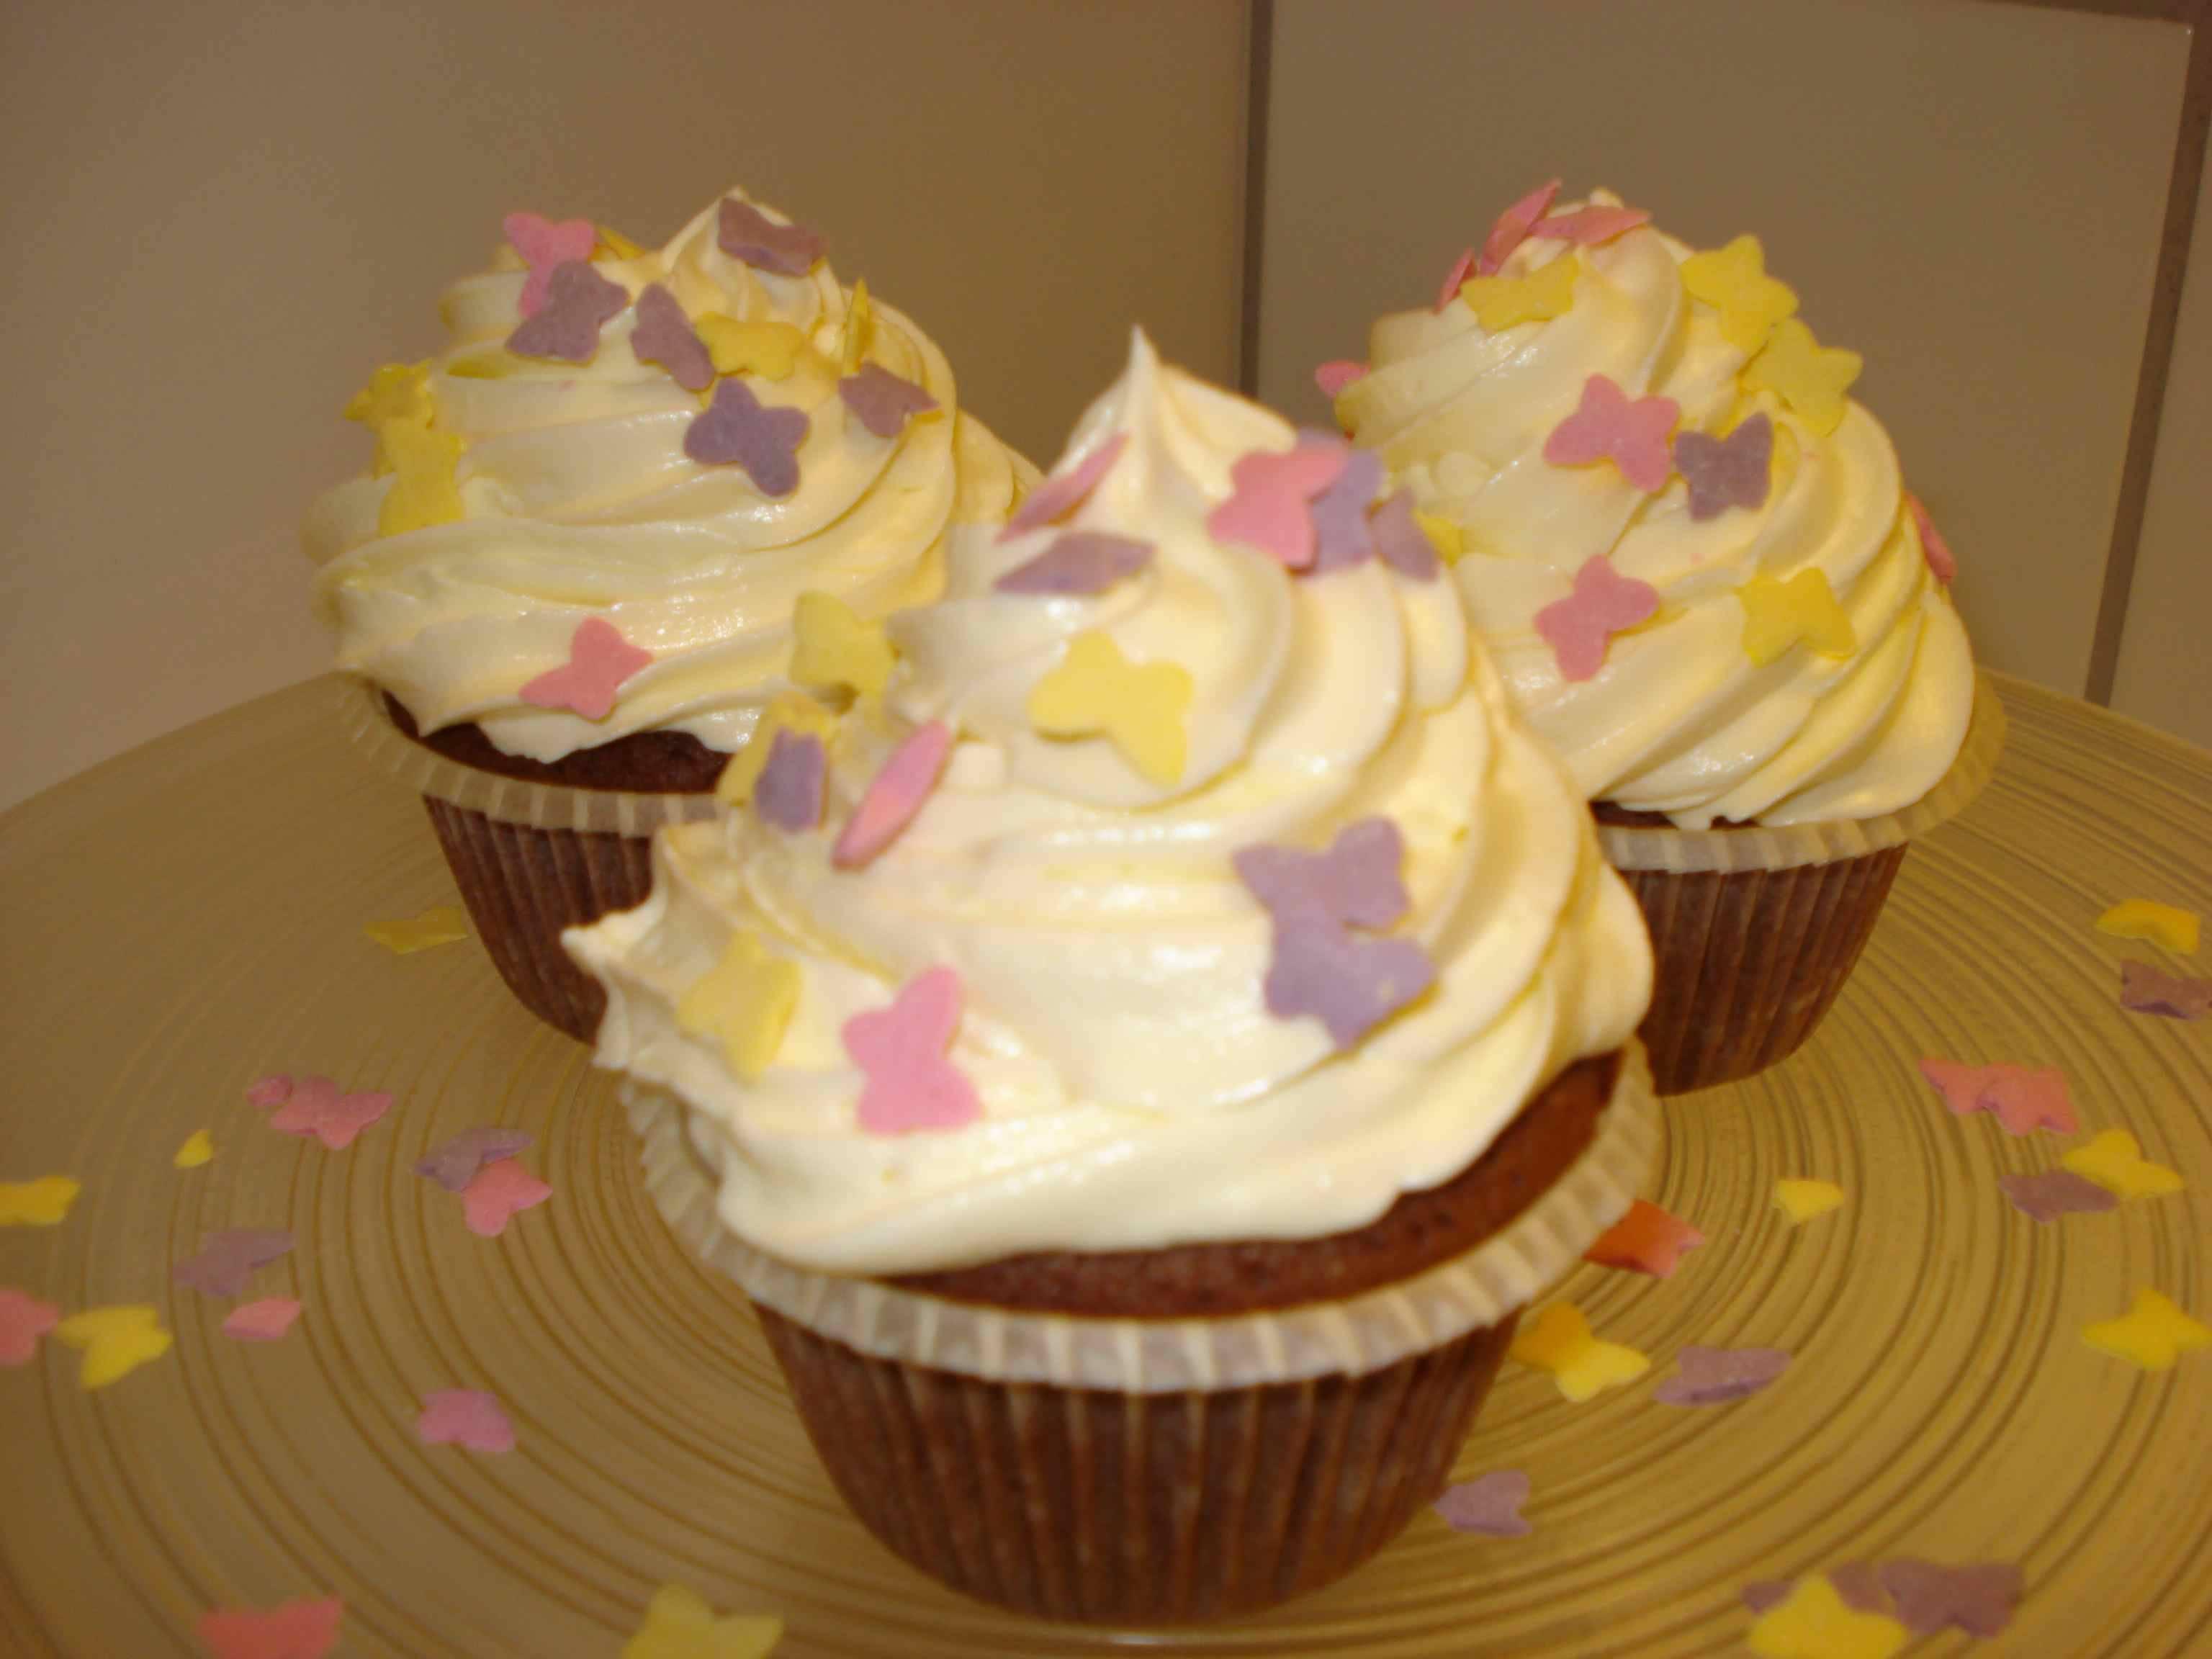 Csokoládés cupcake recept krémsajtos toppinggal főfotó